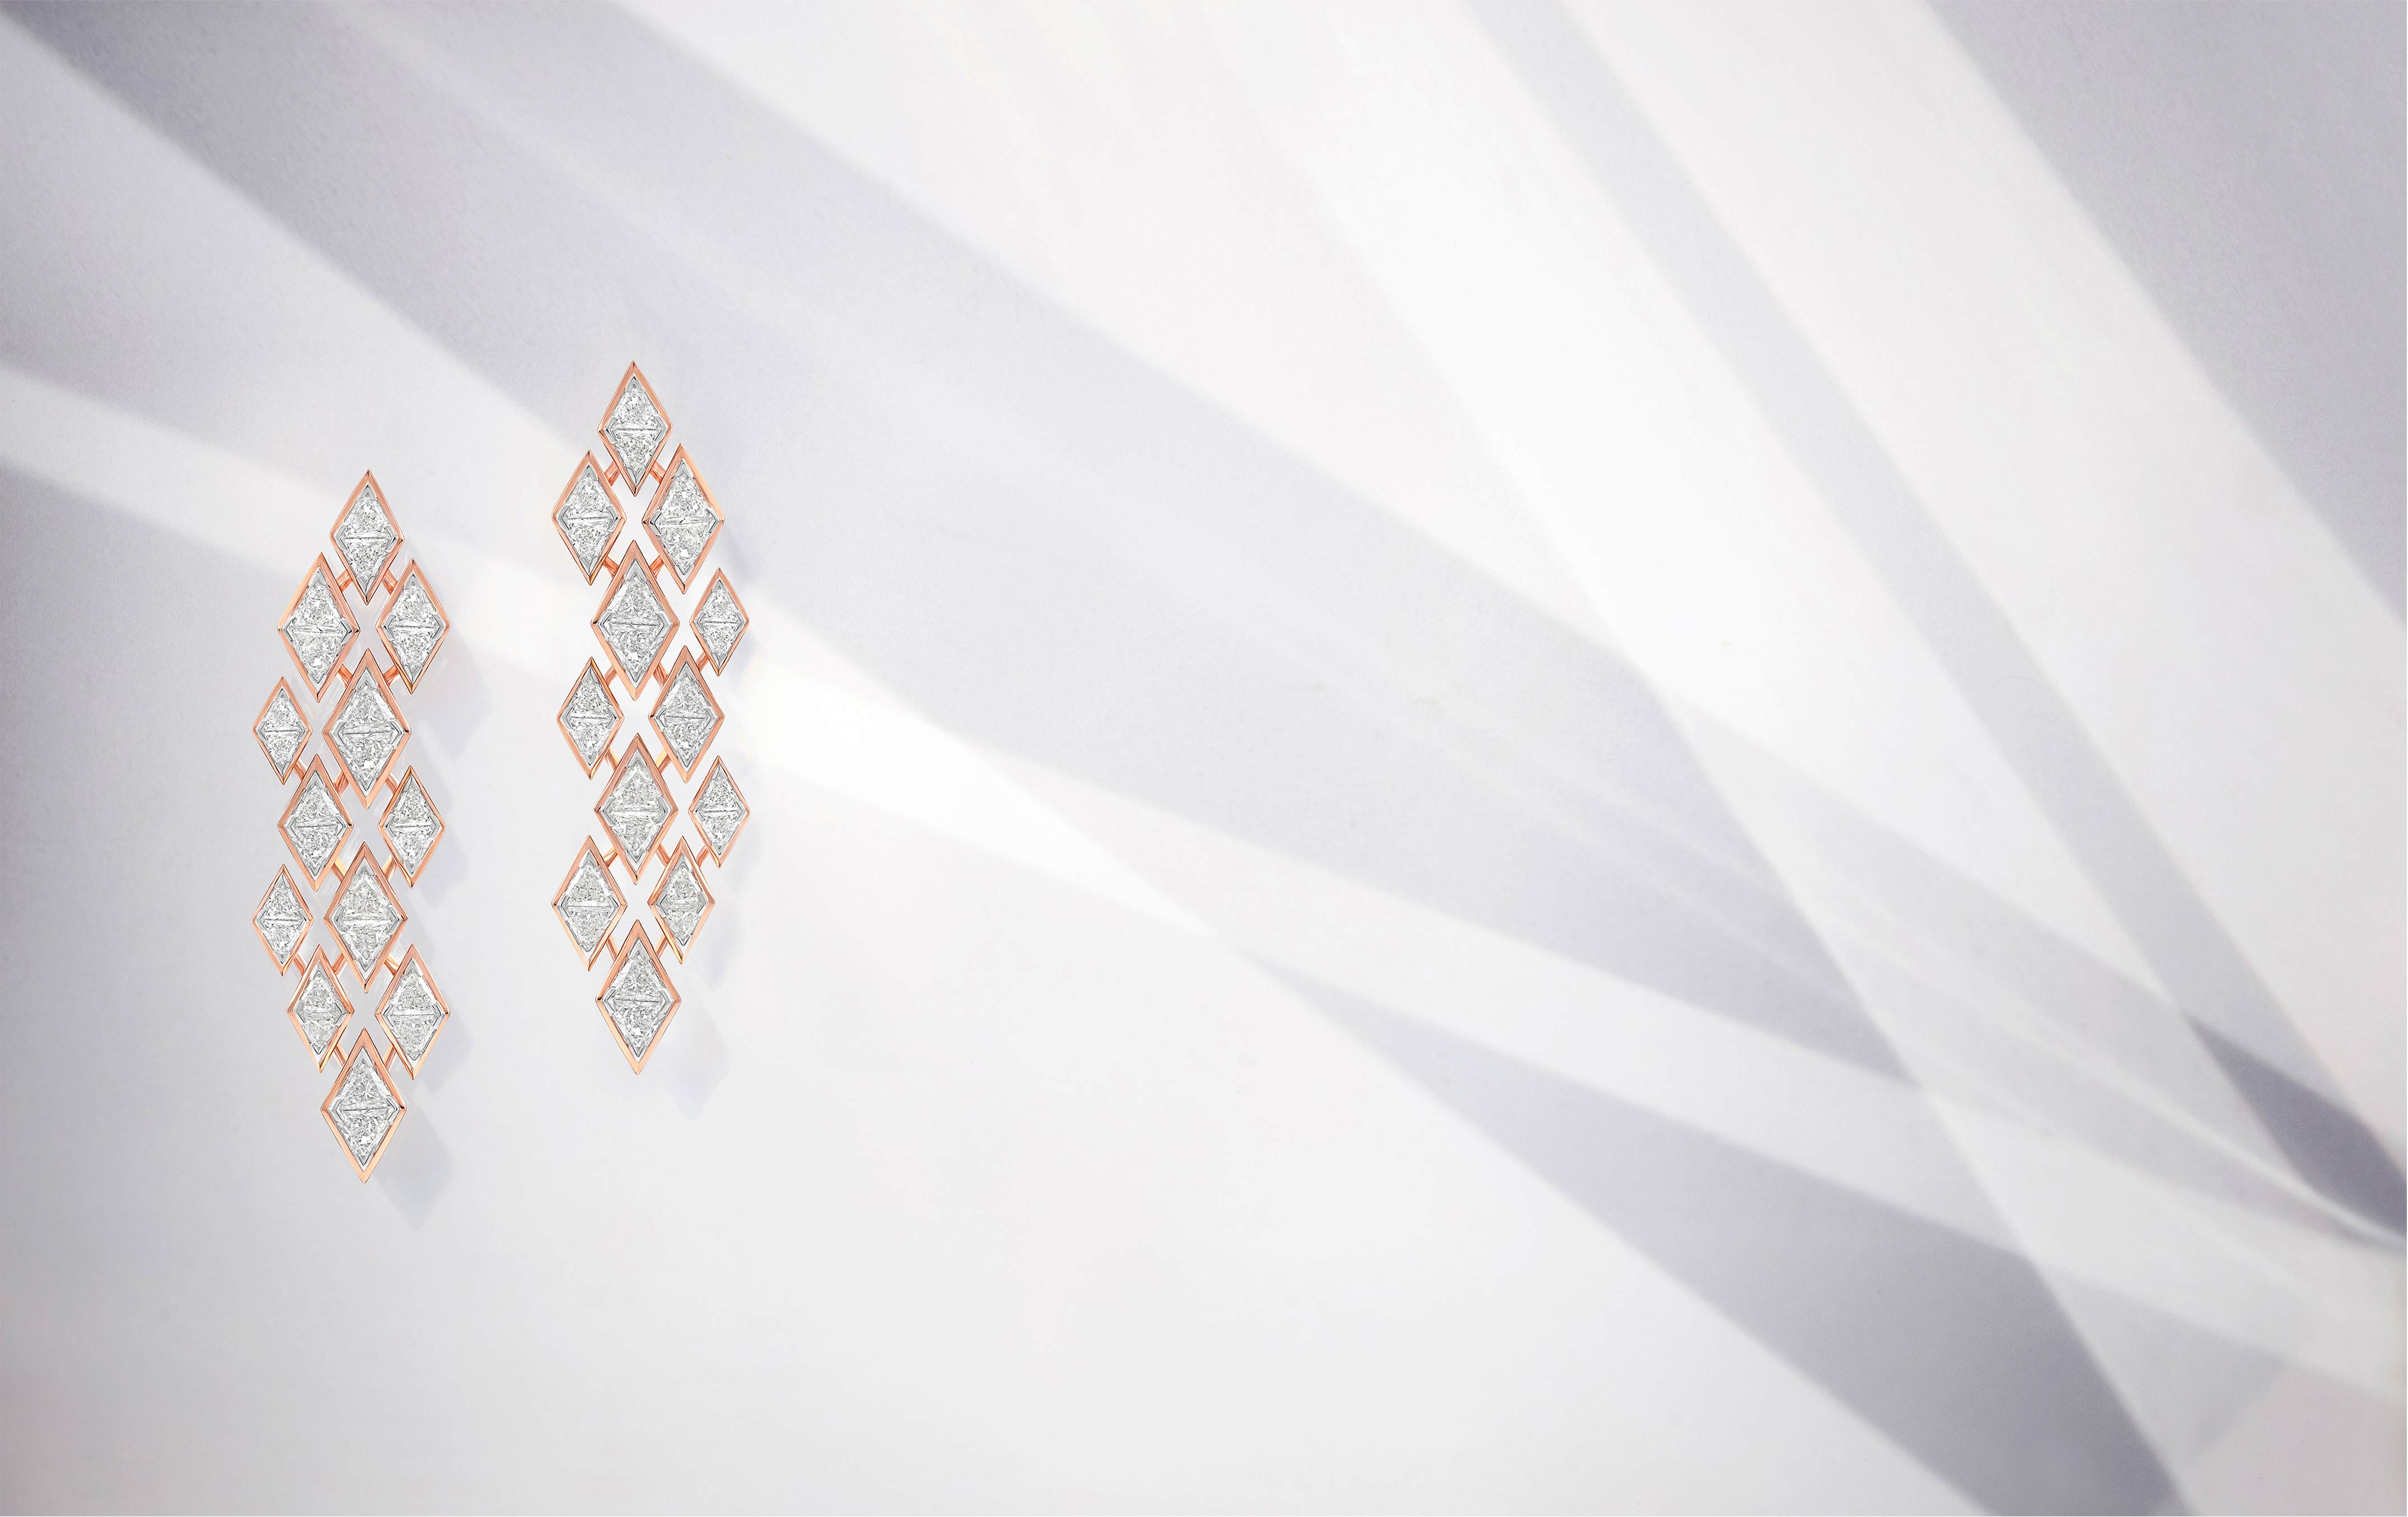 Earrings - trillion-cut, faceted diamonds set like pyramids in a geometric pattern.